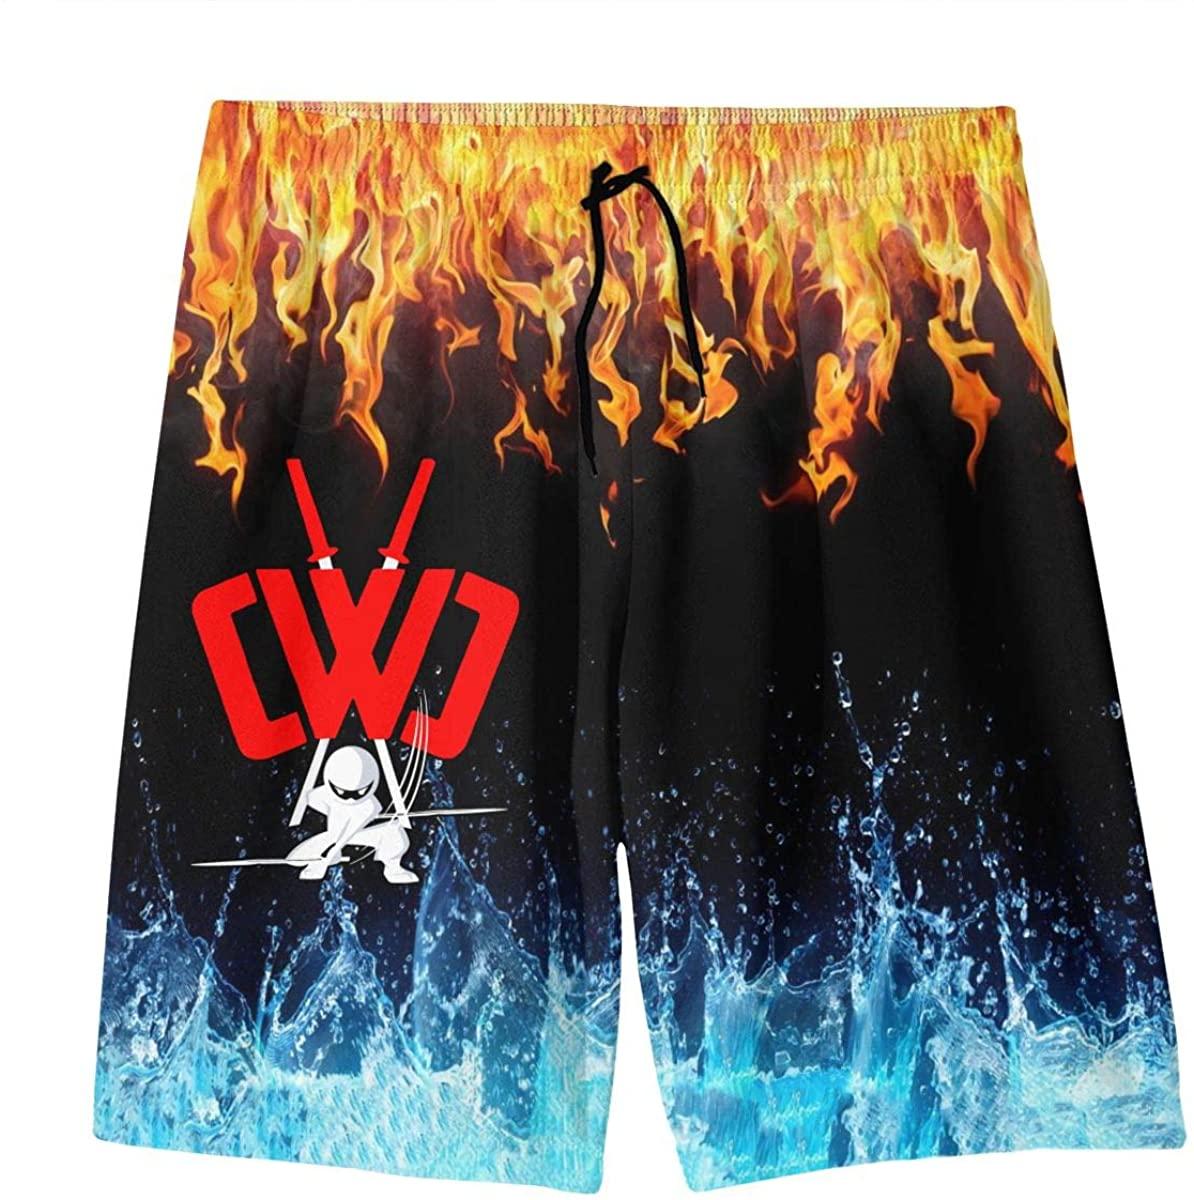 Cwc Chad Wild Clay Swim Trunks Boys Quick Dry Beachwear Sports Running Board Shorts